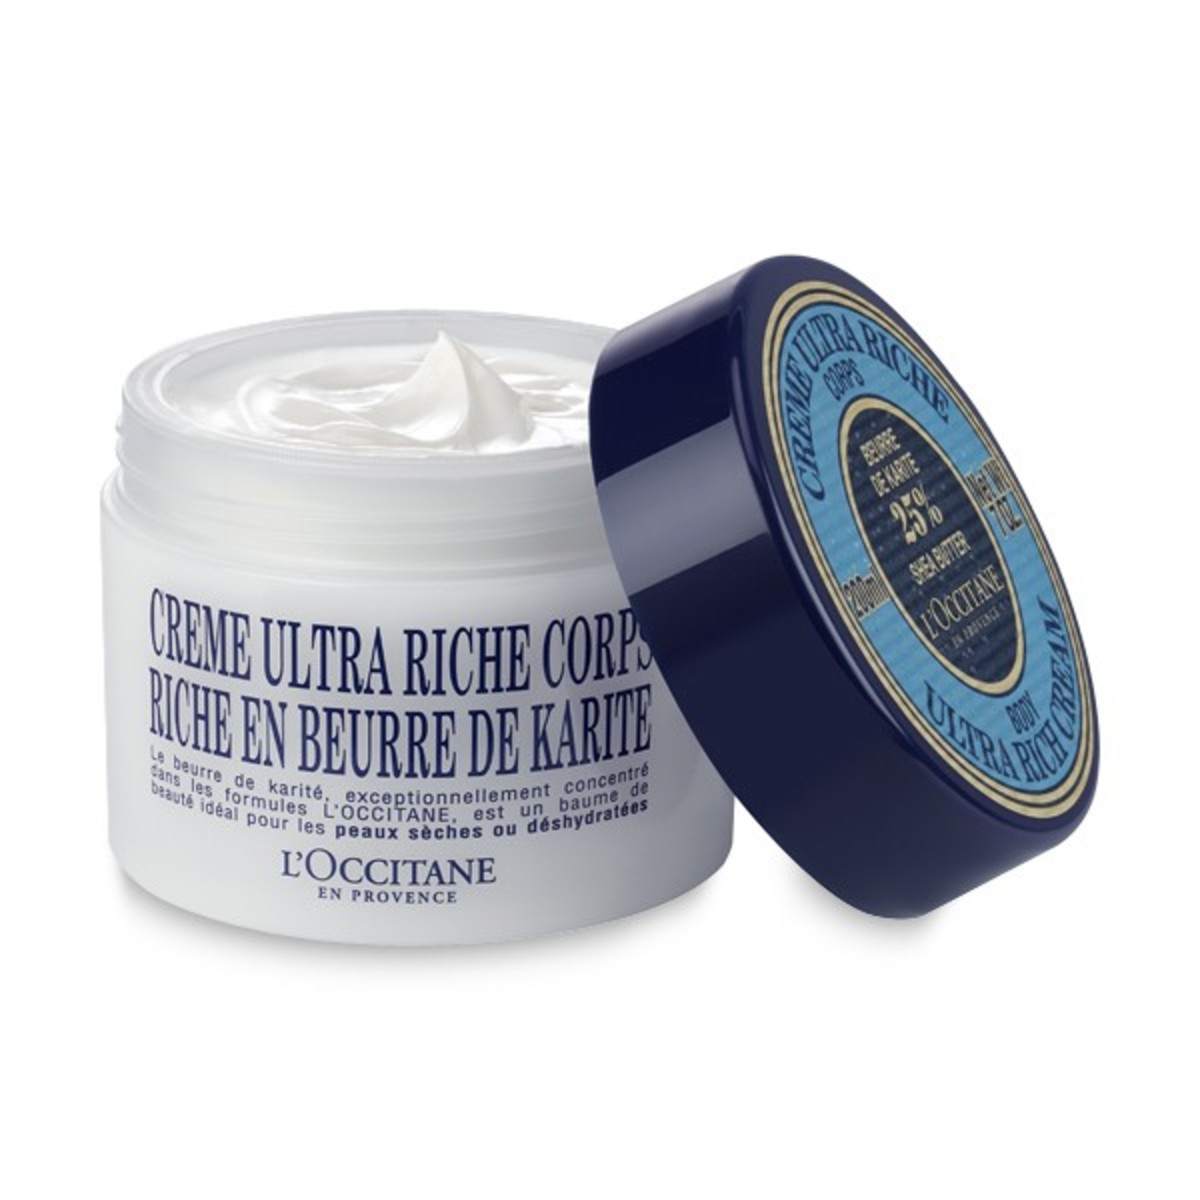 Shea Butter Ultra Rich Body Cream 200ml [Parallel Import]